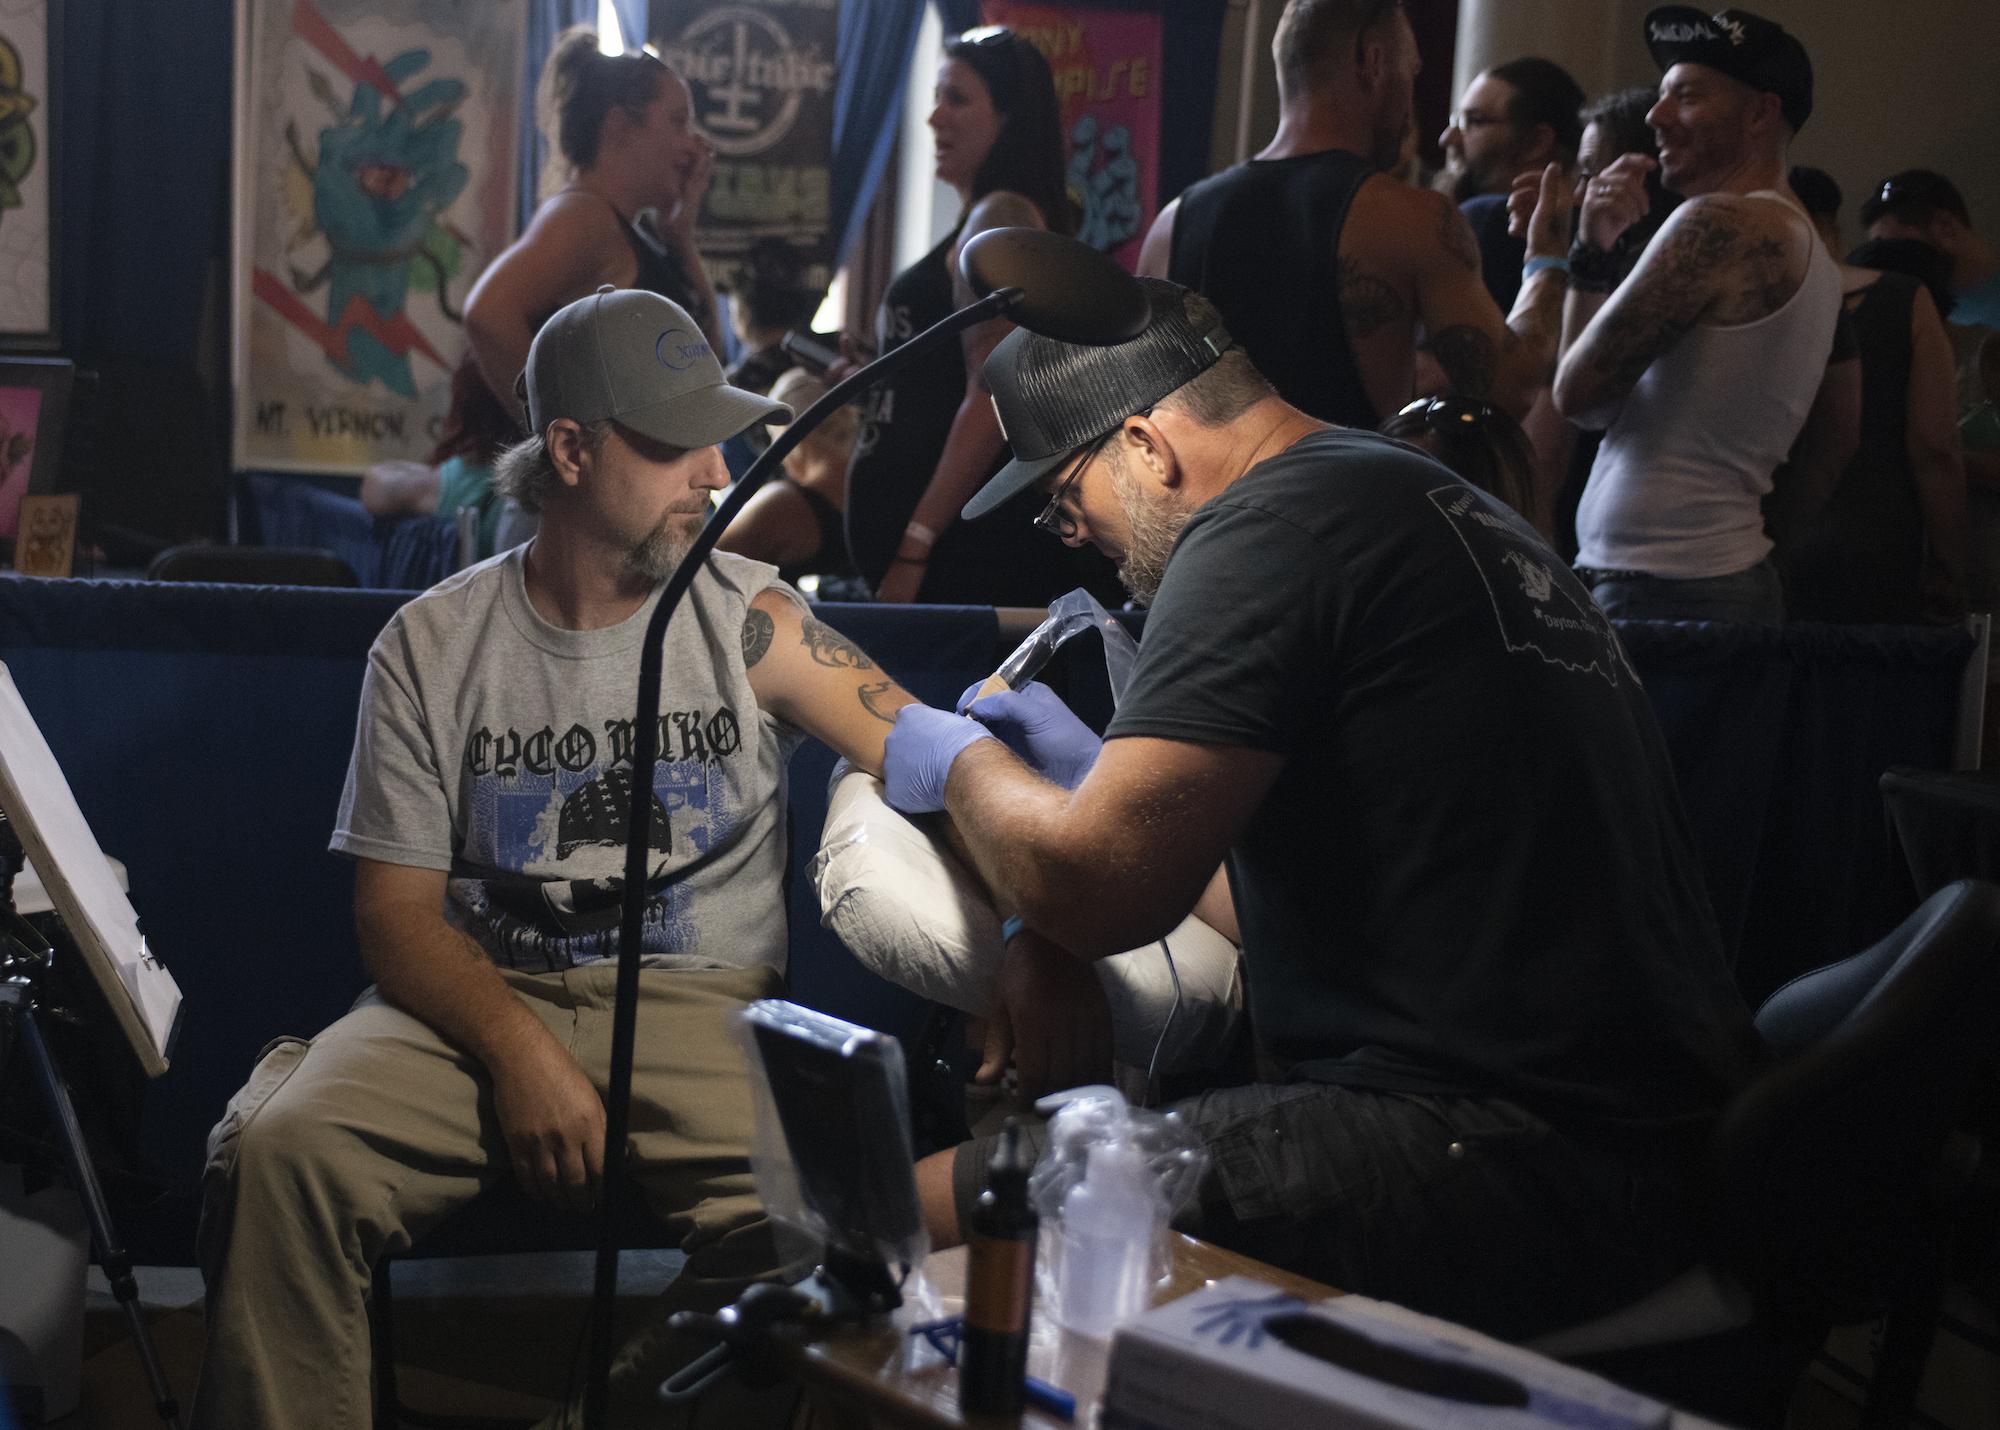 Tattoos-8187.jpg